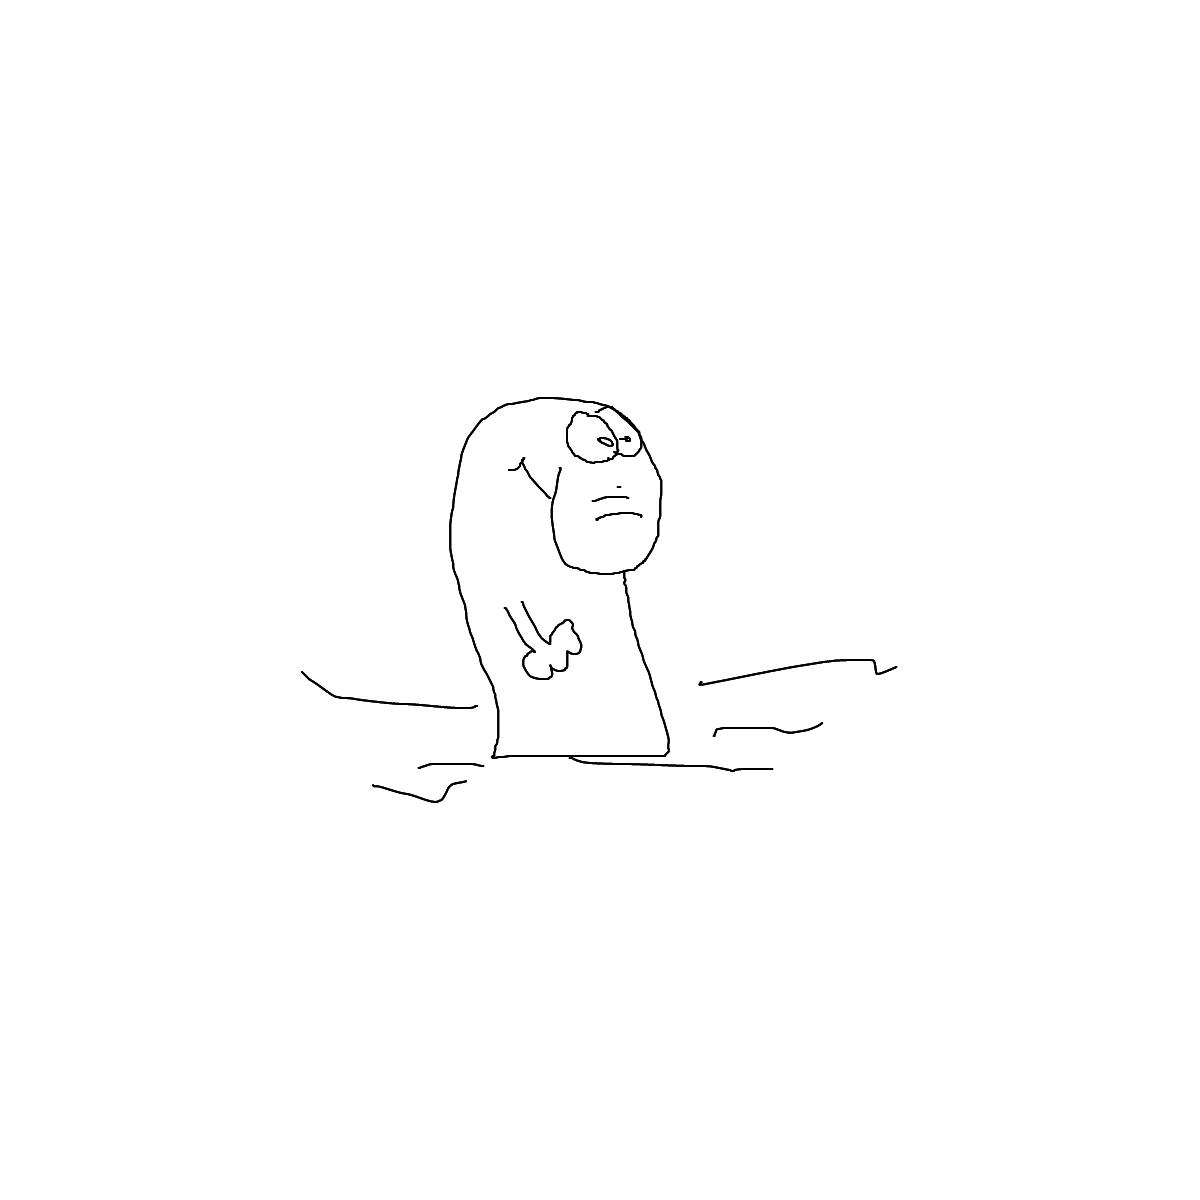 BAAAM drawing#7850 lat:37.9518470764160160lng: 23.7433567047119140